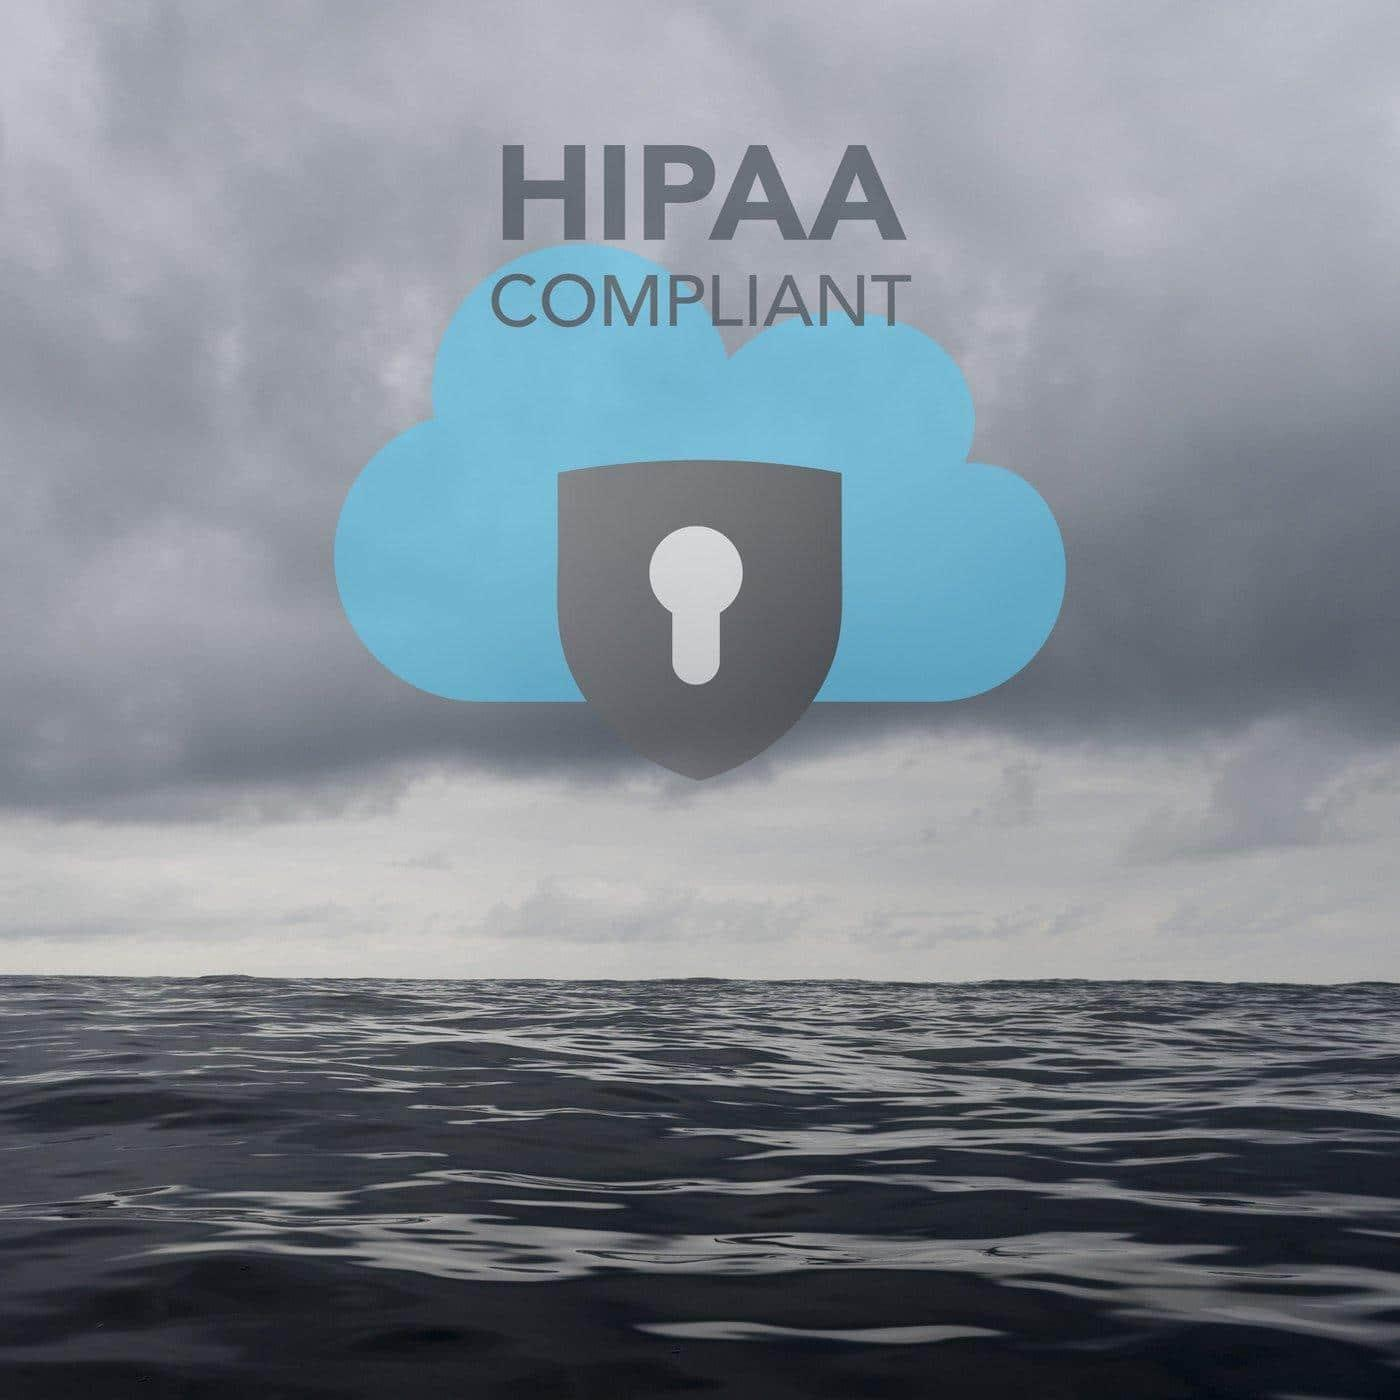 hipaa-compliance-in-the-cloud.jpg